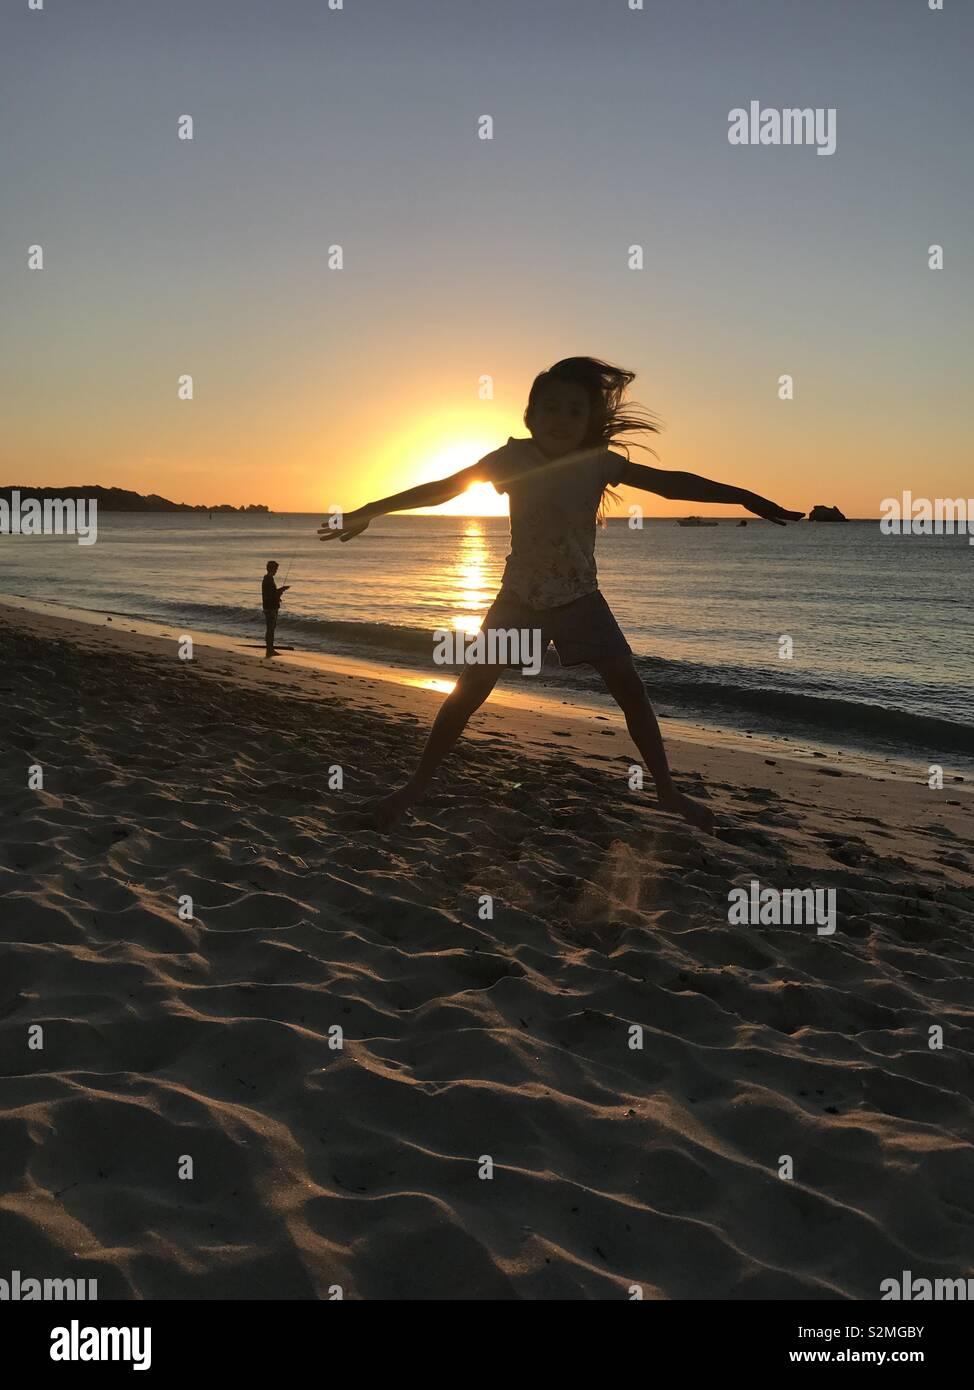 Star jump sunset - Stock Image